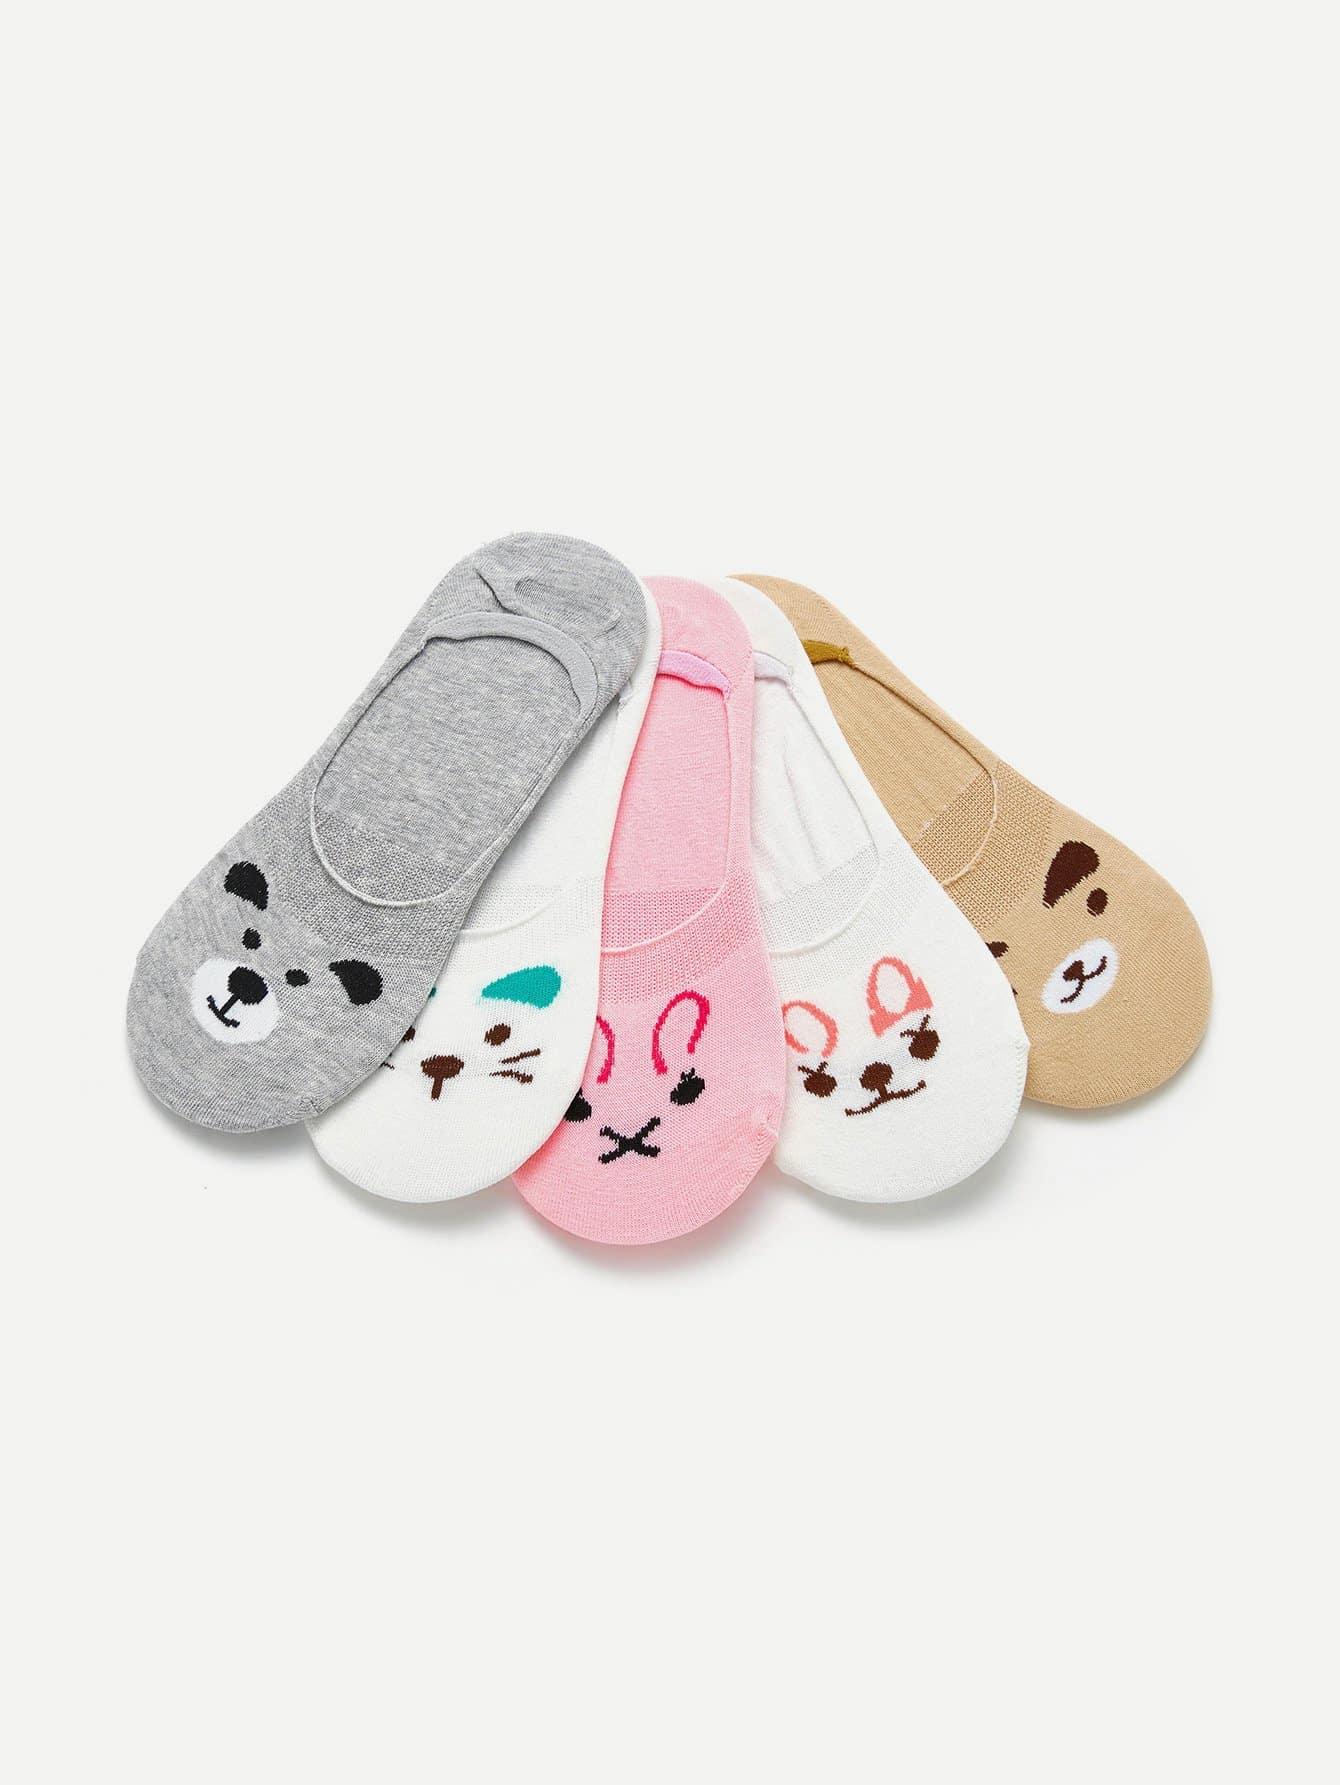 Animal Print Invisible Socks 5pairs animal embroidery invisible socks 3pairs